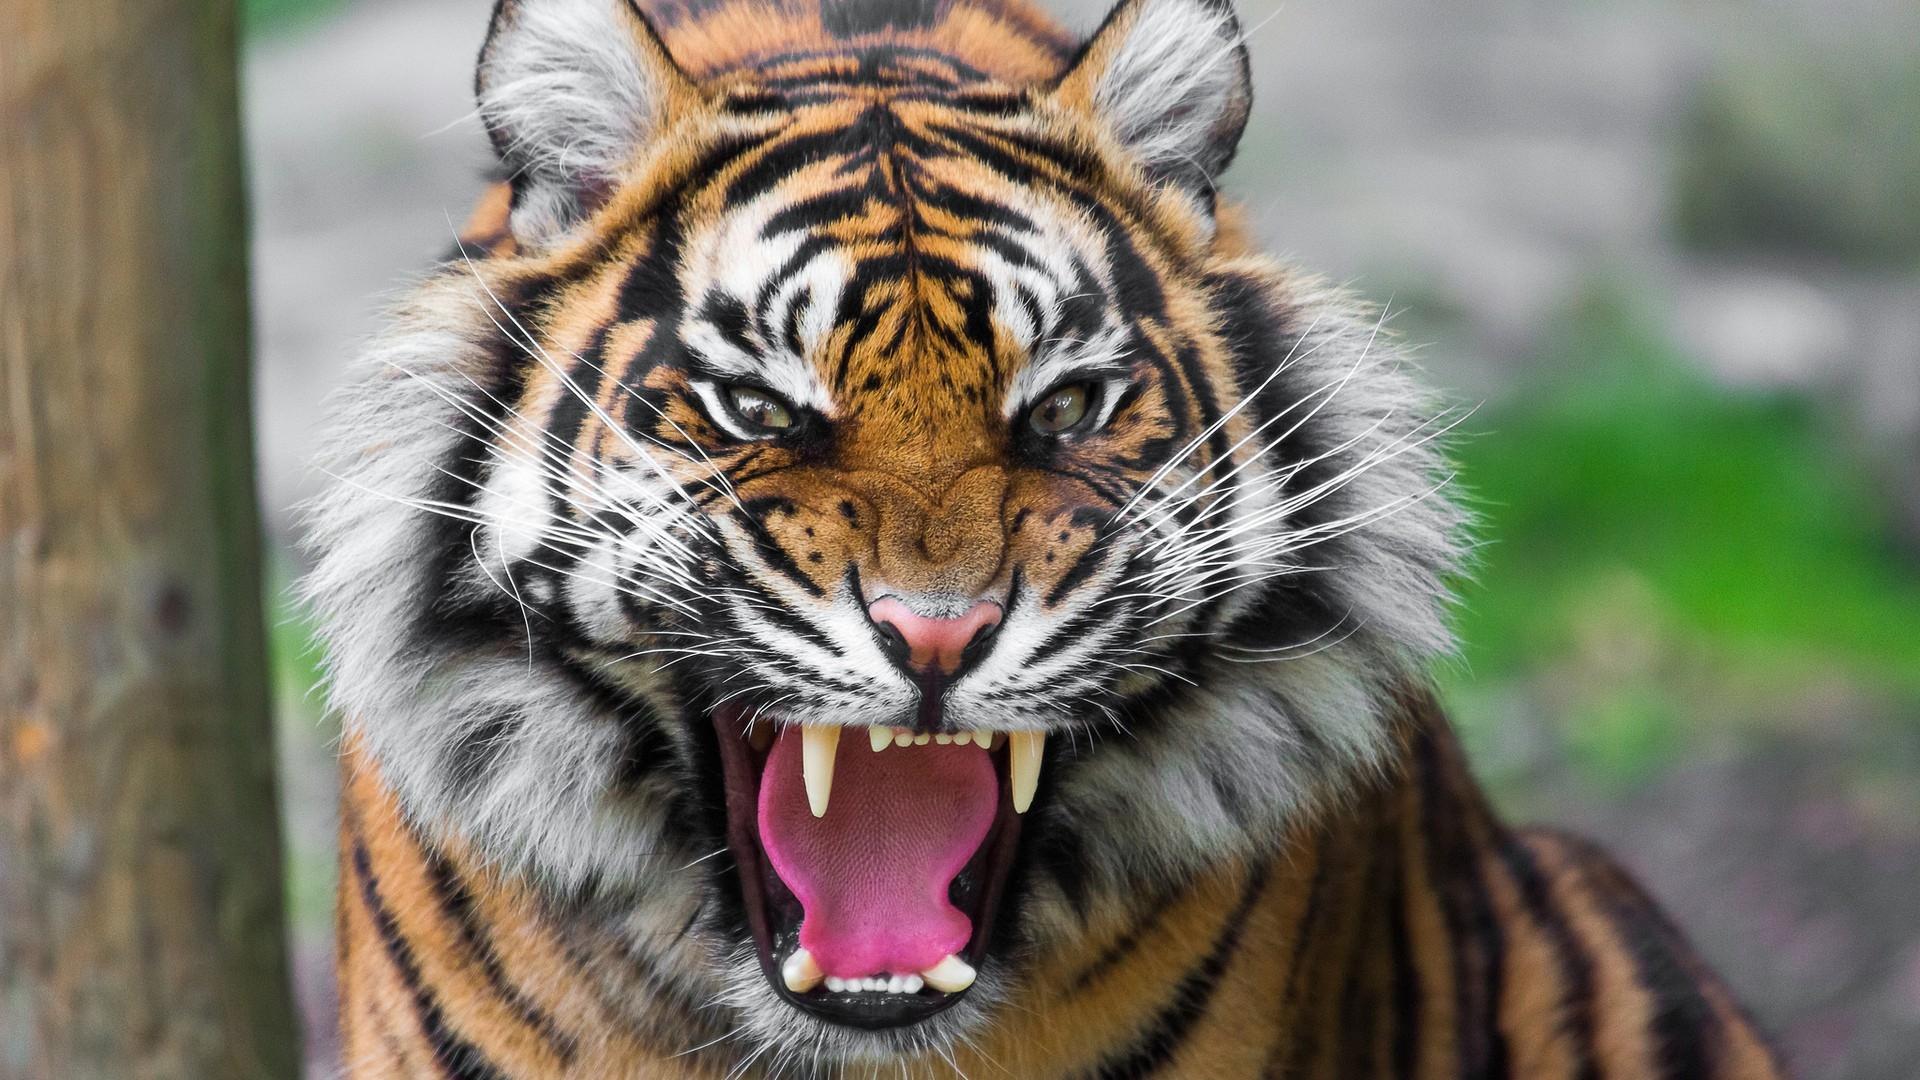 Tiger Face Teeth Anger Big Cat